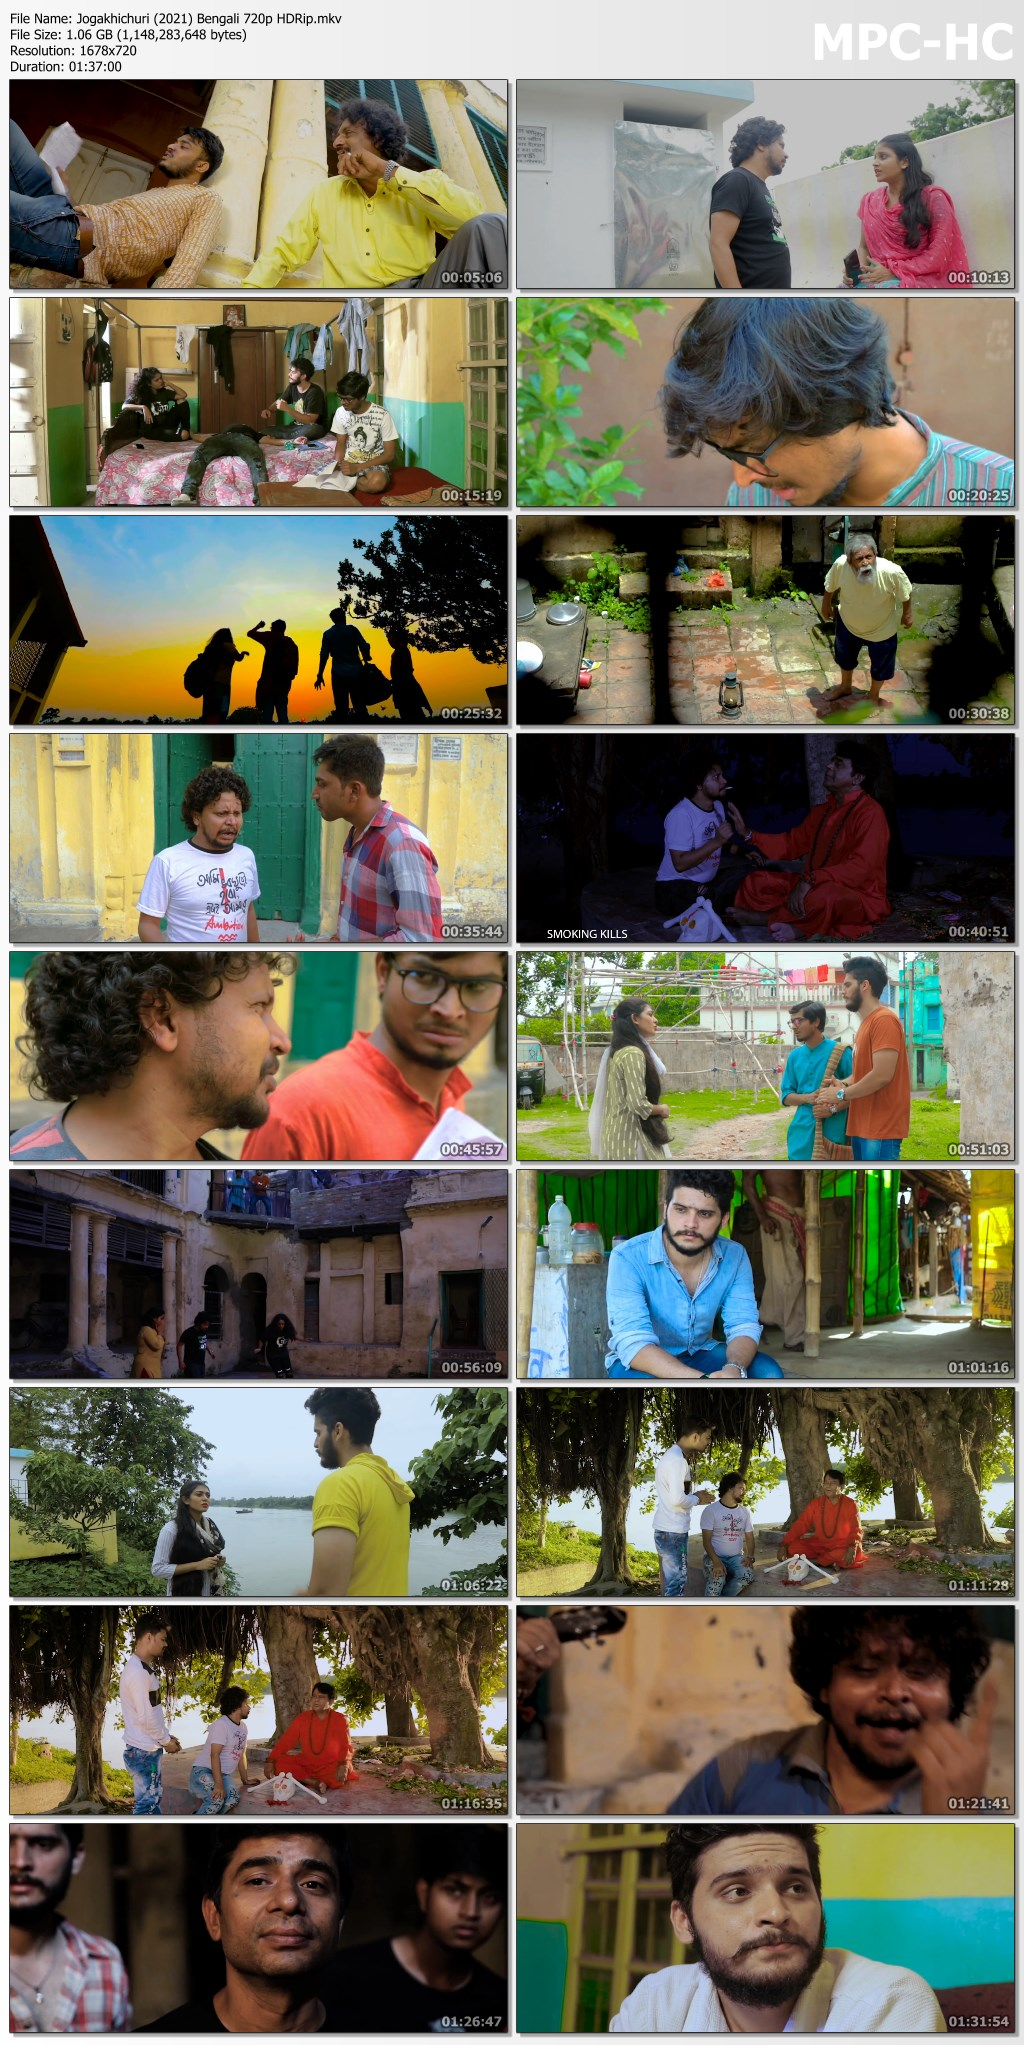 Jogakhichuri (2021) Bengali 720p HDRip.mkv thumbs